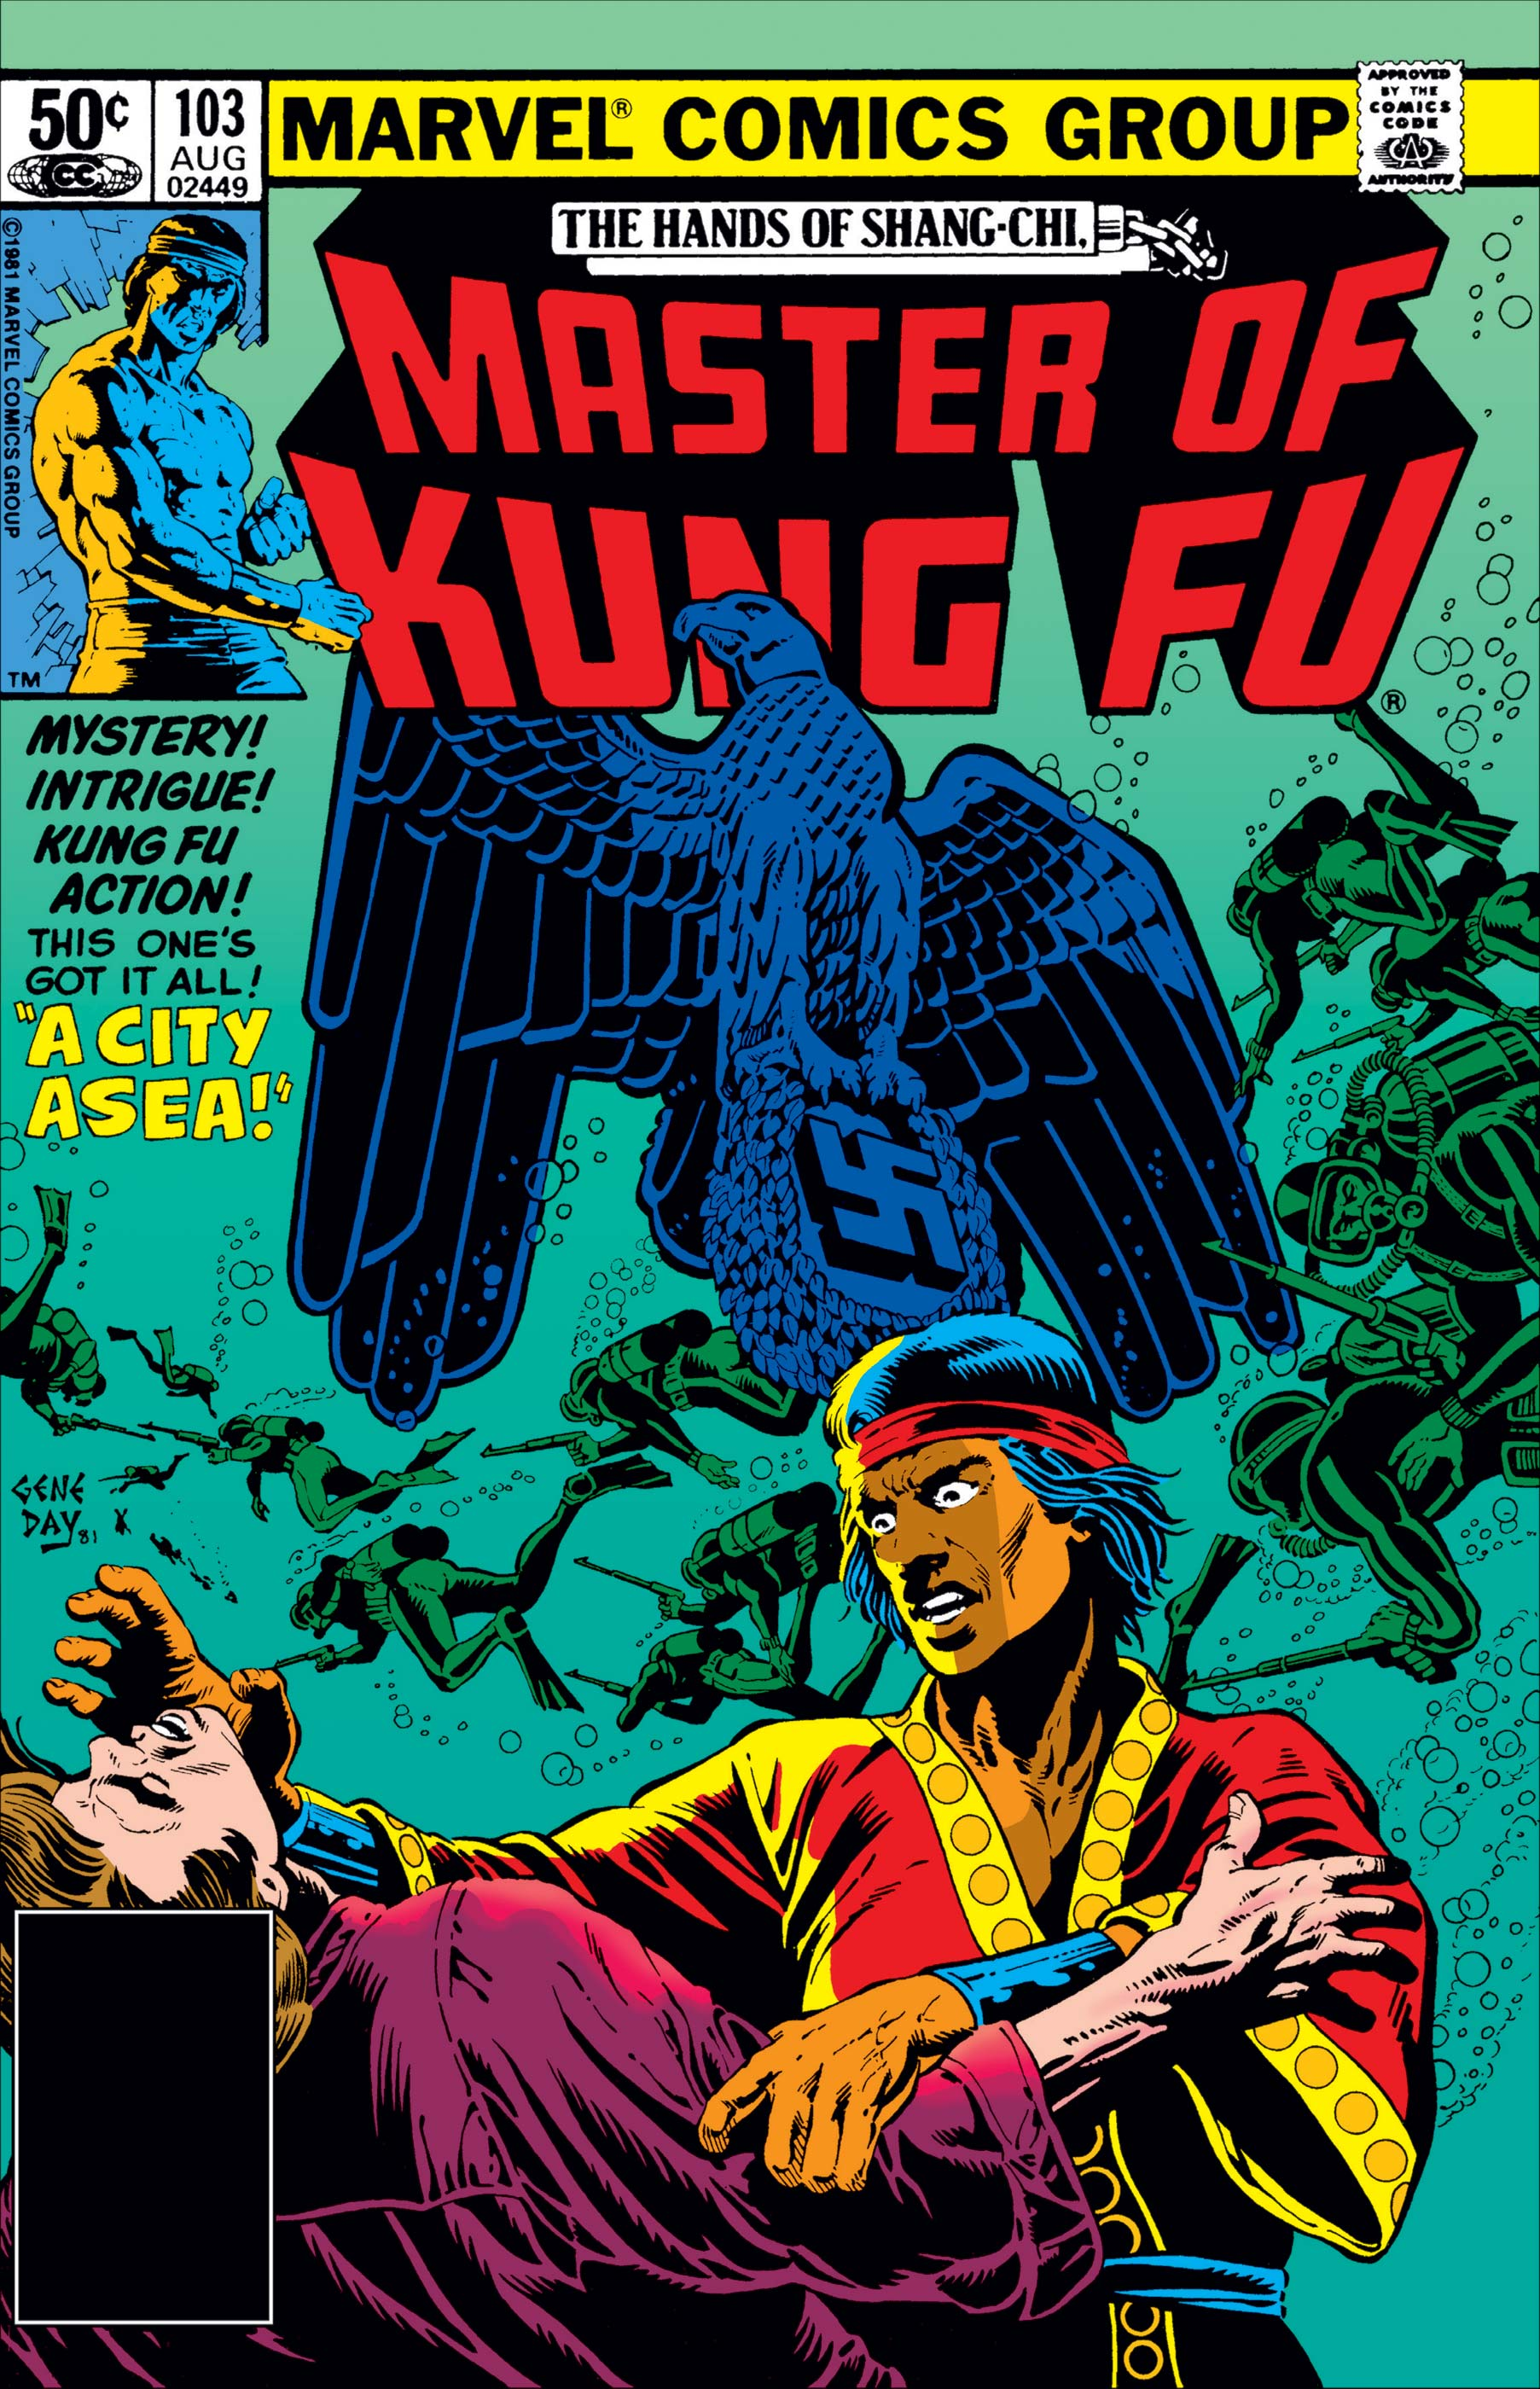 Master of Kung Fu (1974) #103